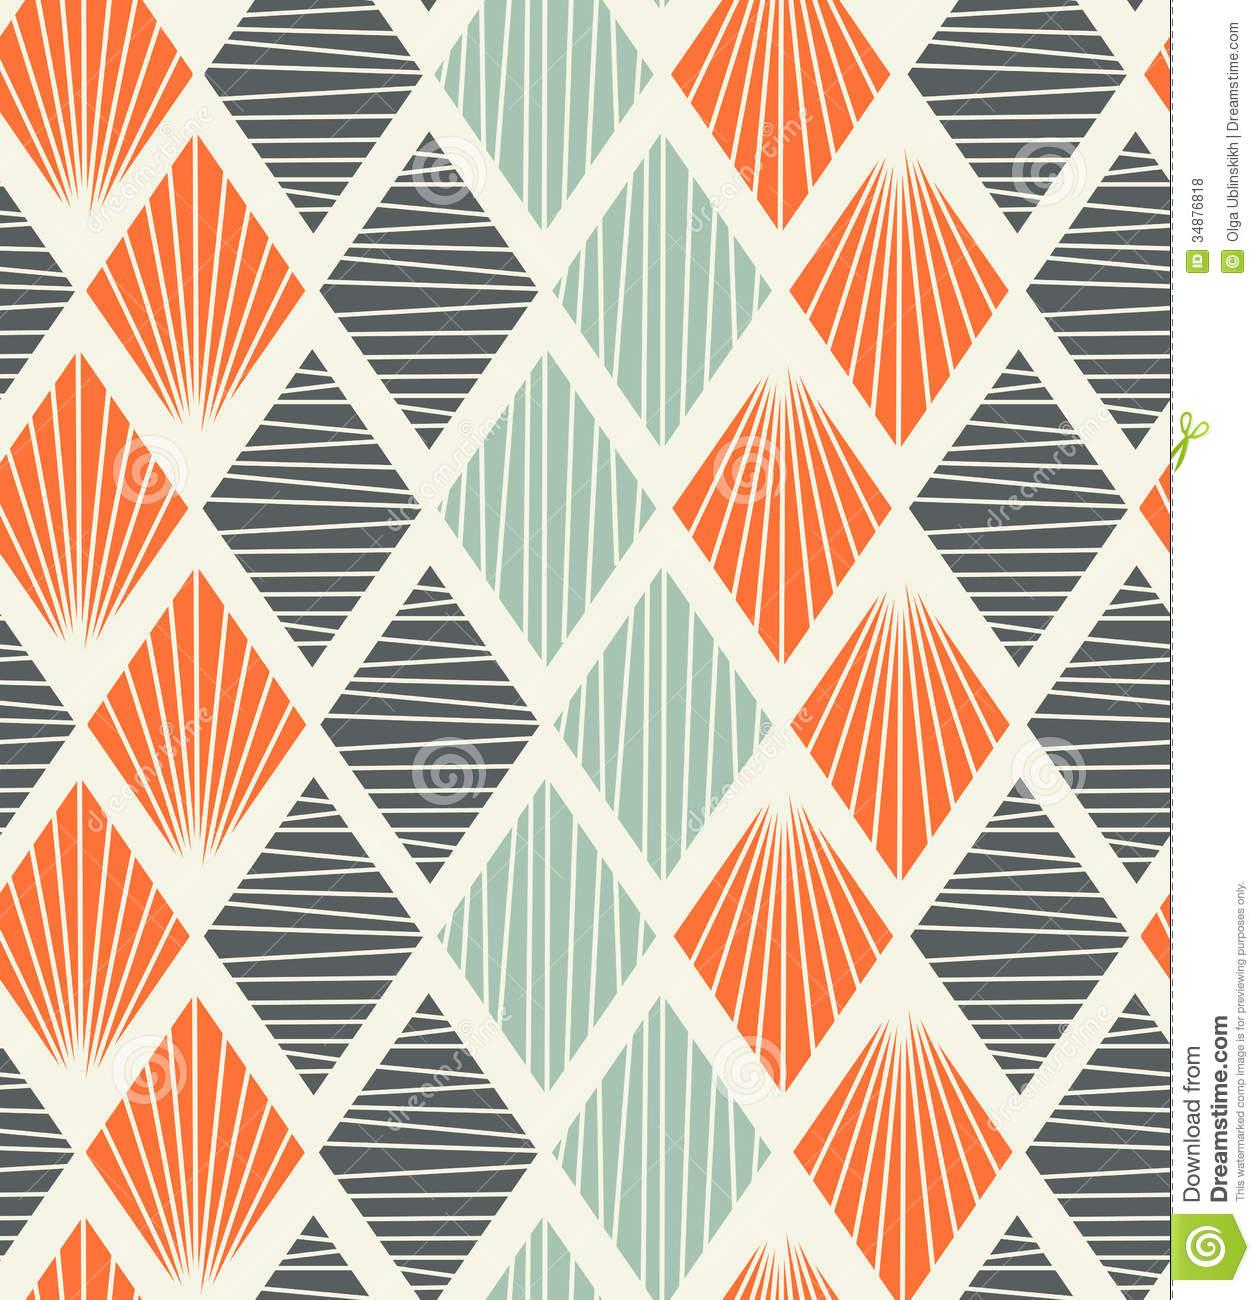 Rhomb clipart geometry Rhombs Geometric Background Pattern Seamless